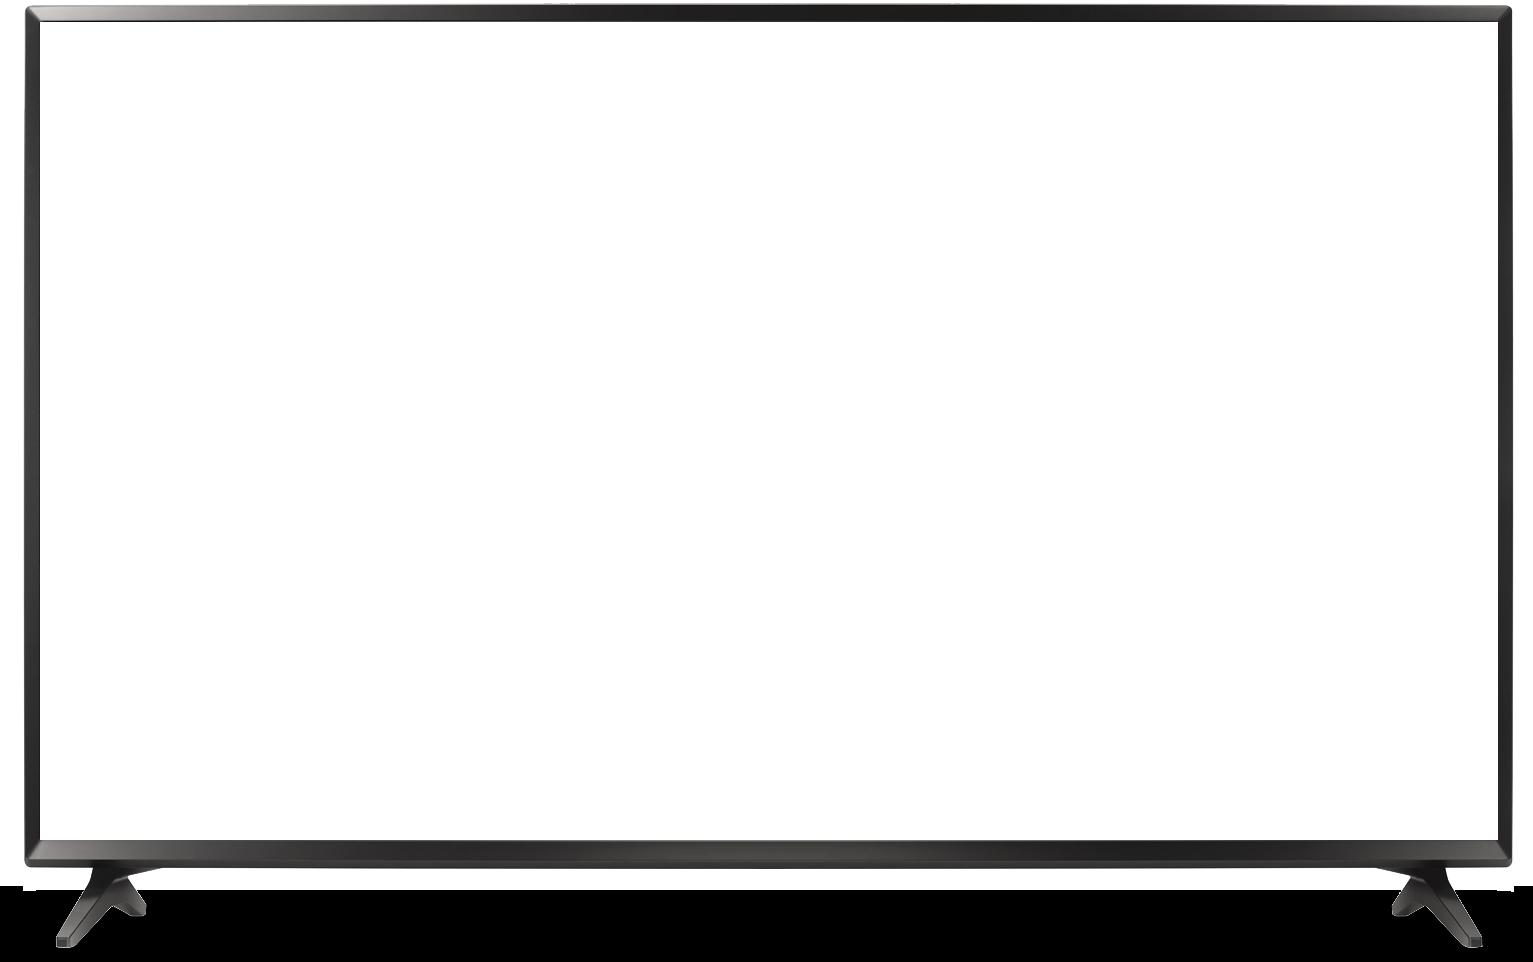 TV-frame-shadows.png